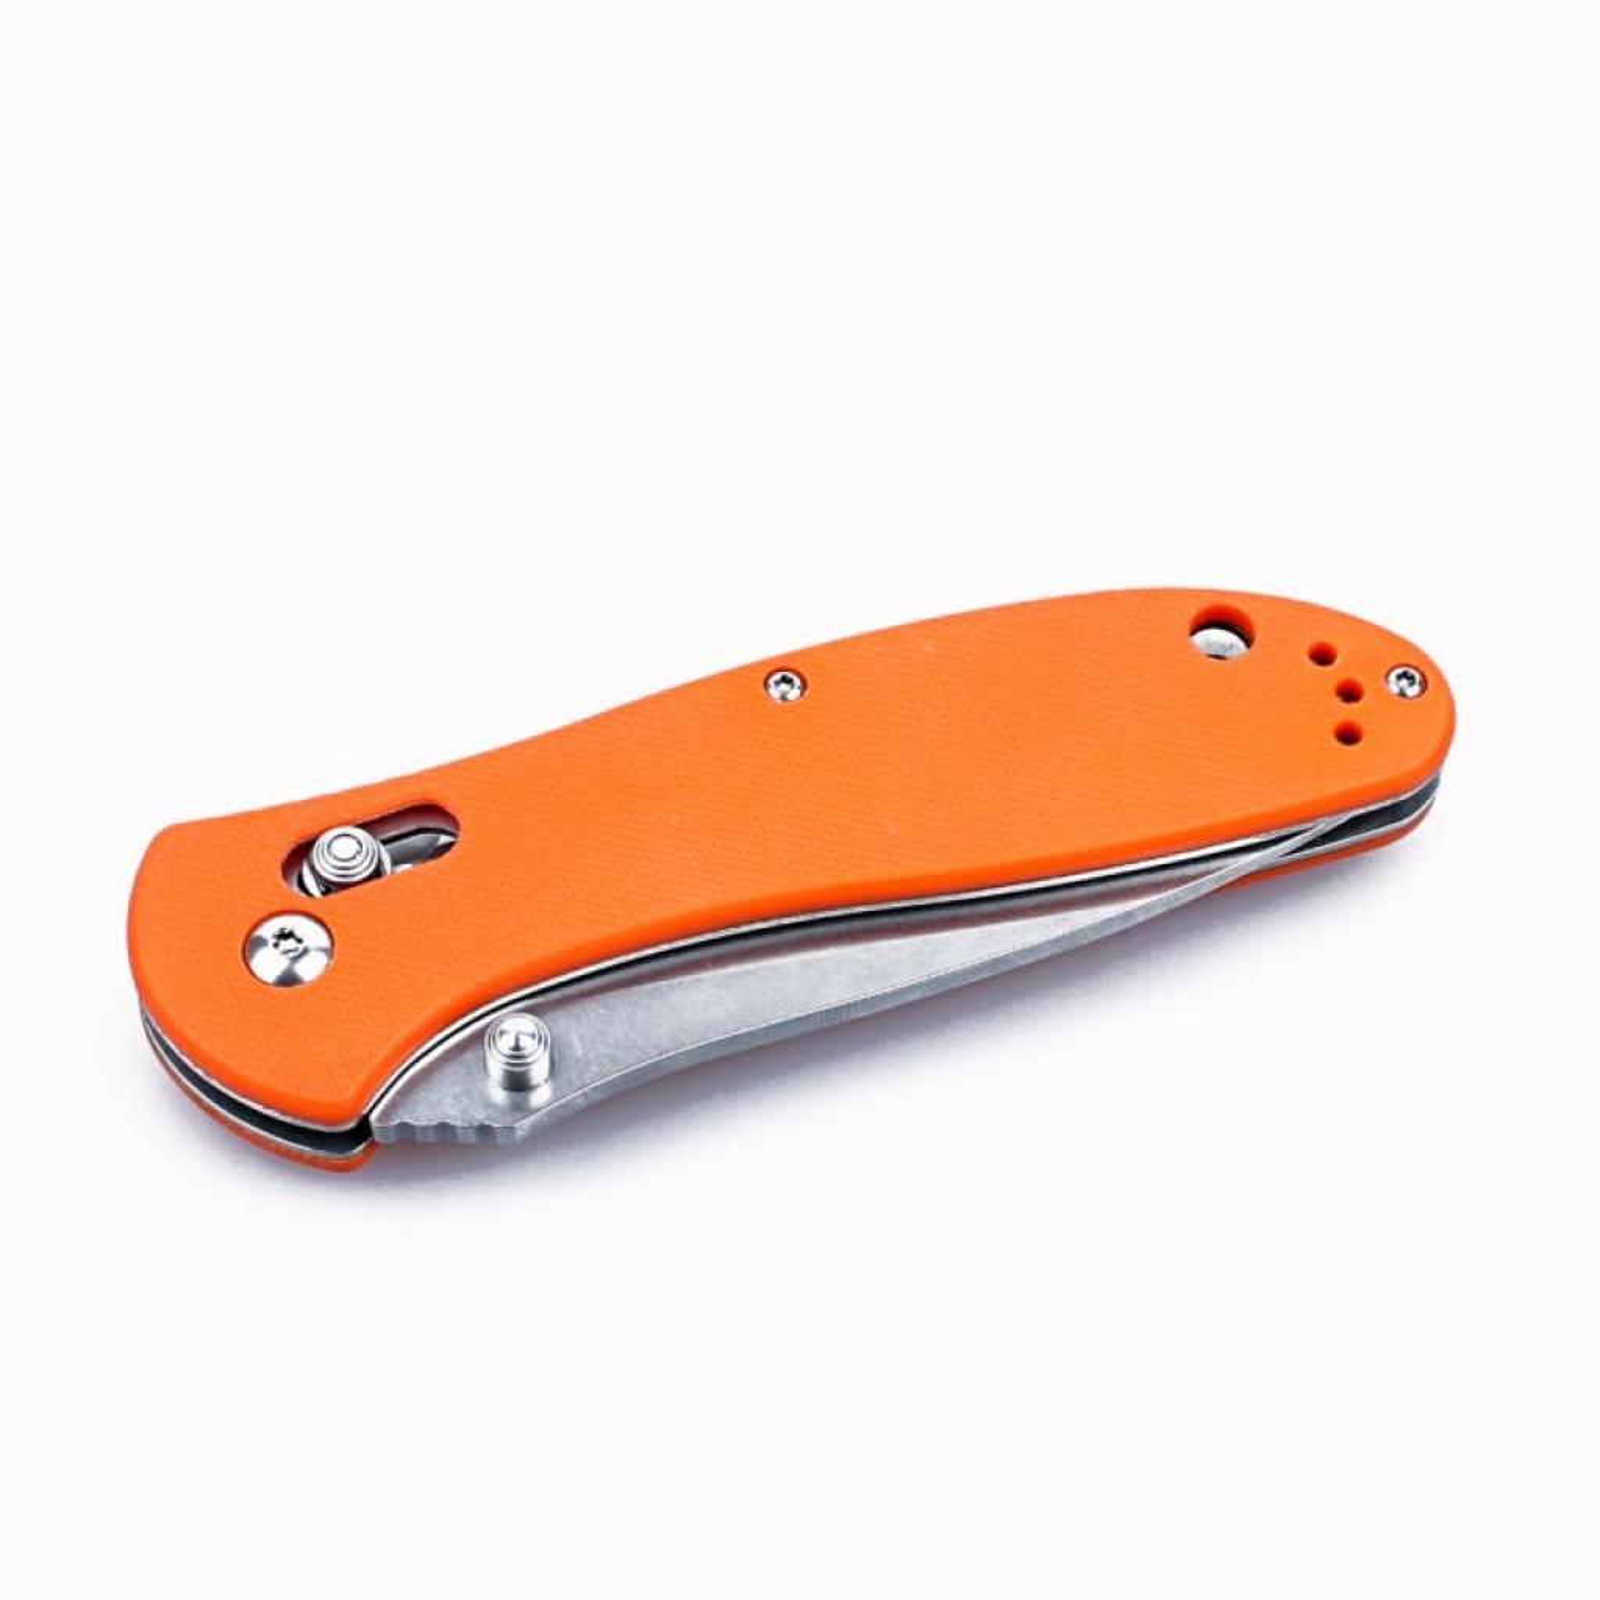 Нож Ganzo G7392-WD1 изображение 3